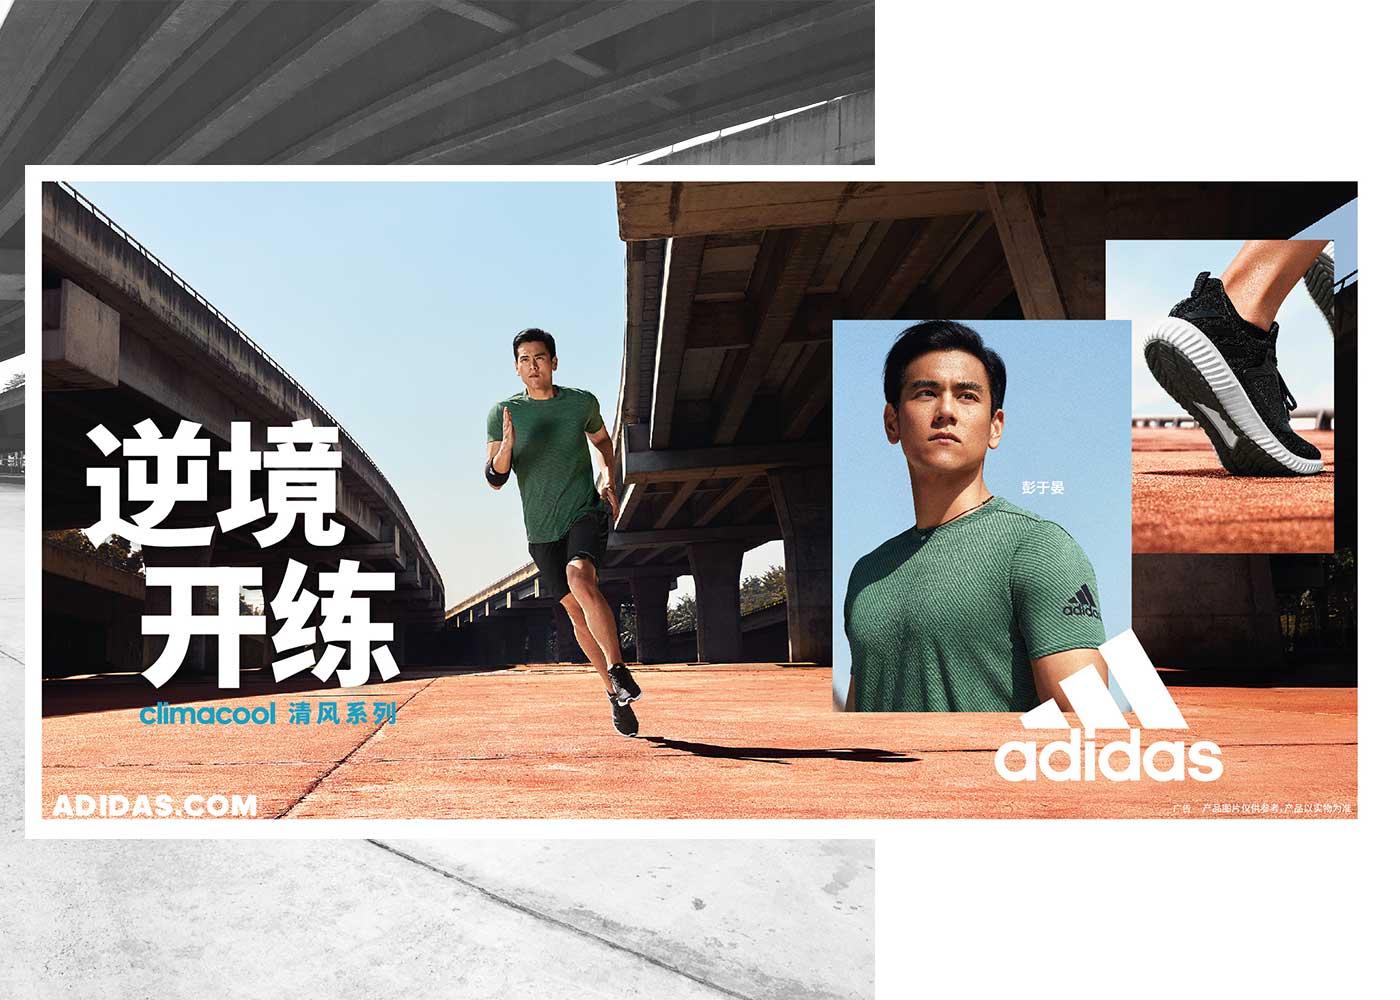 Concesión Caballero Muchas situaciones peligrosas  Mujiri - Showcase: Adidas ClimaCool // Not Made For Normal (逆境开练)